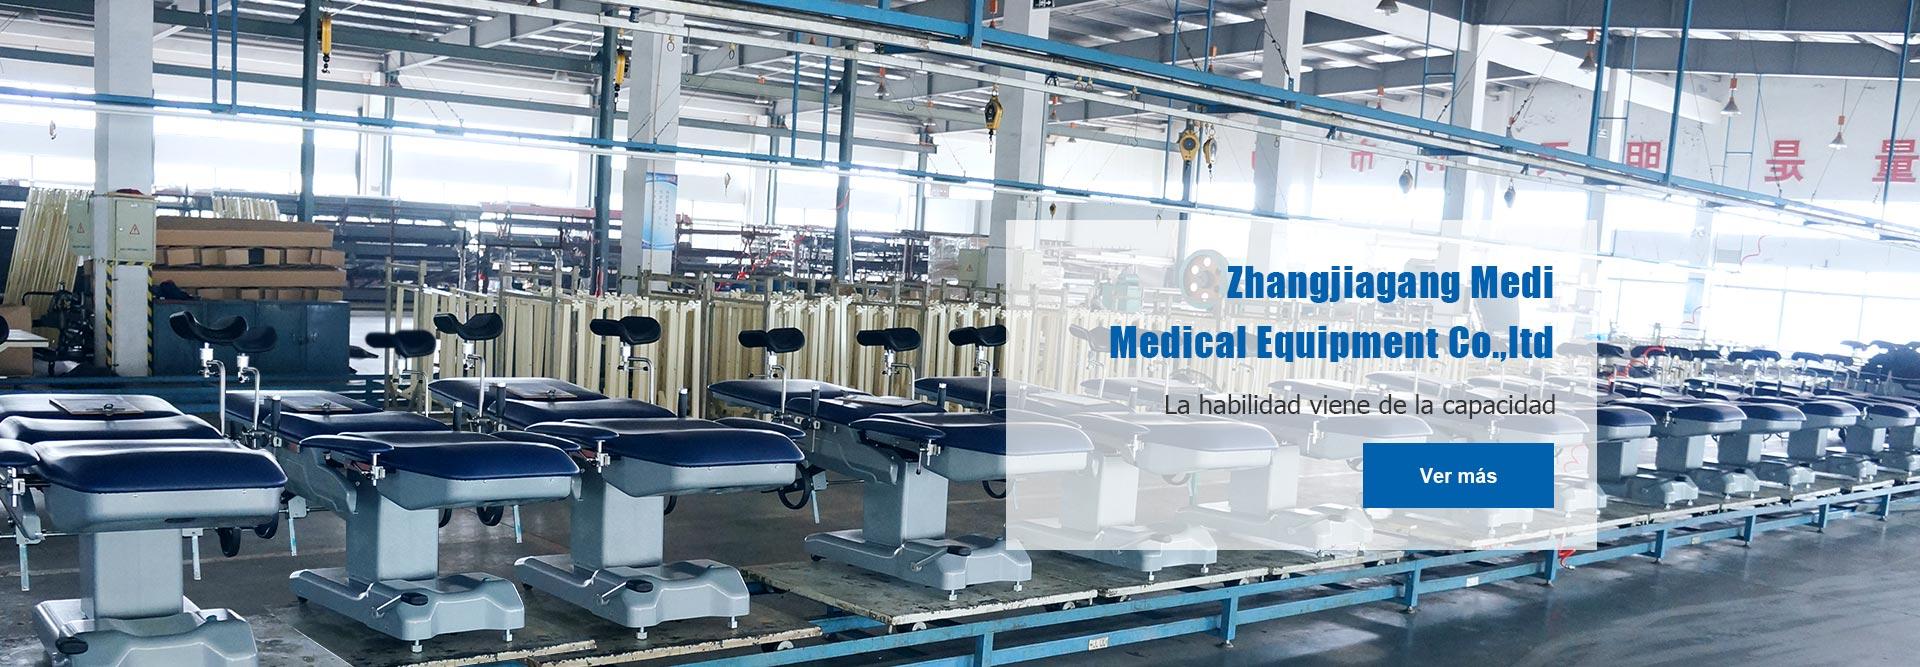 medik-medical